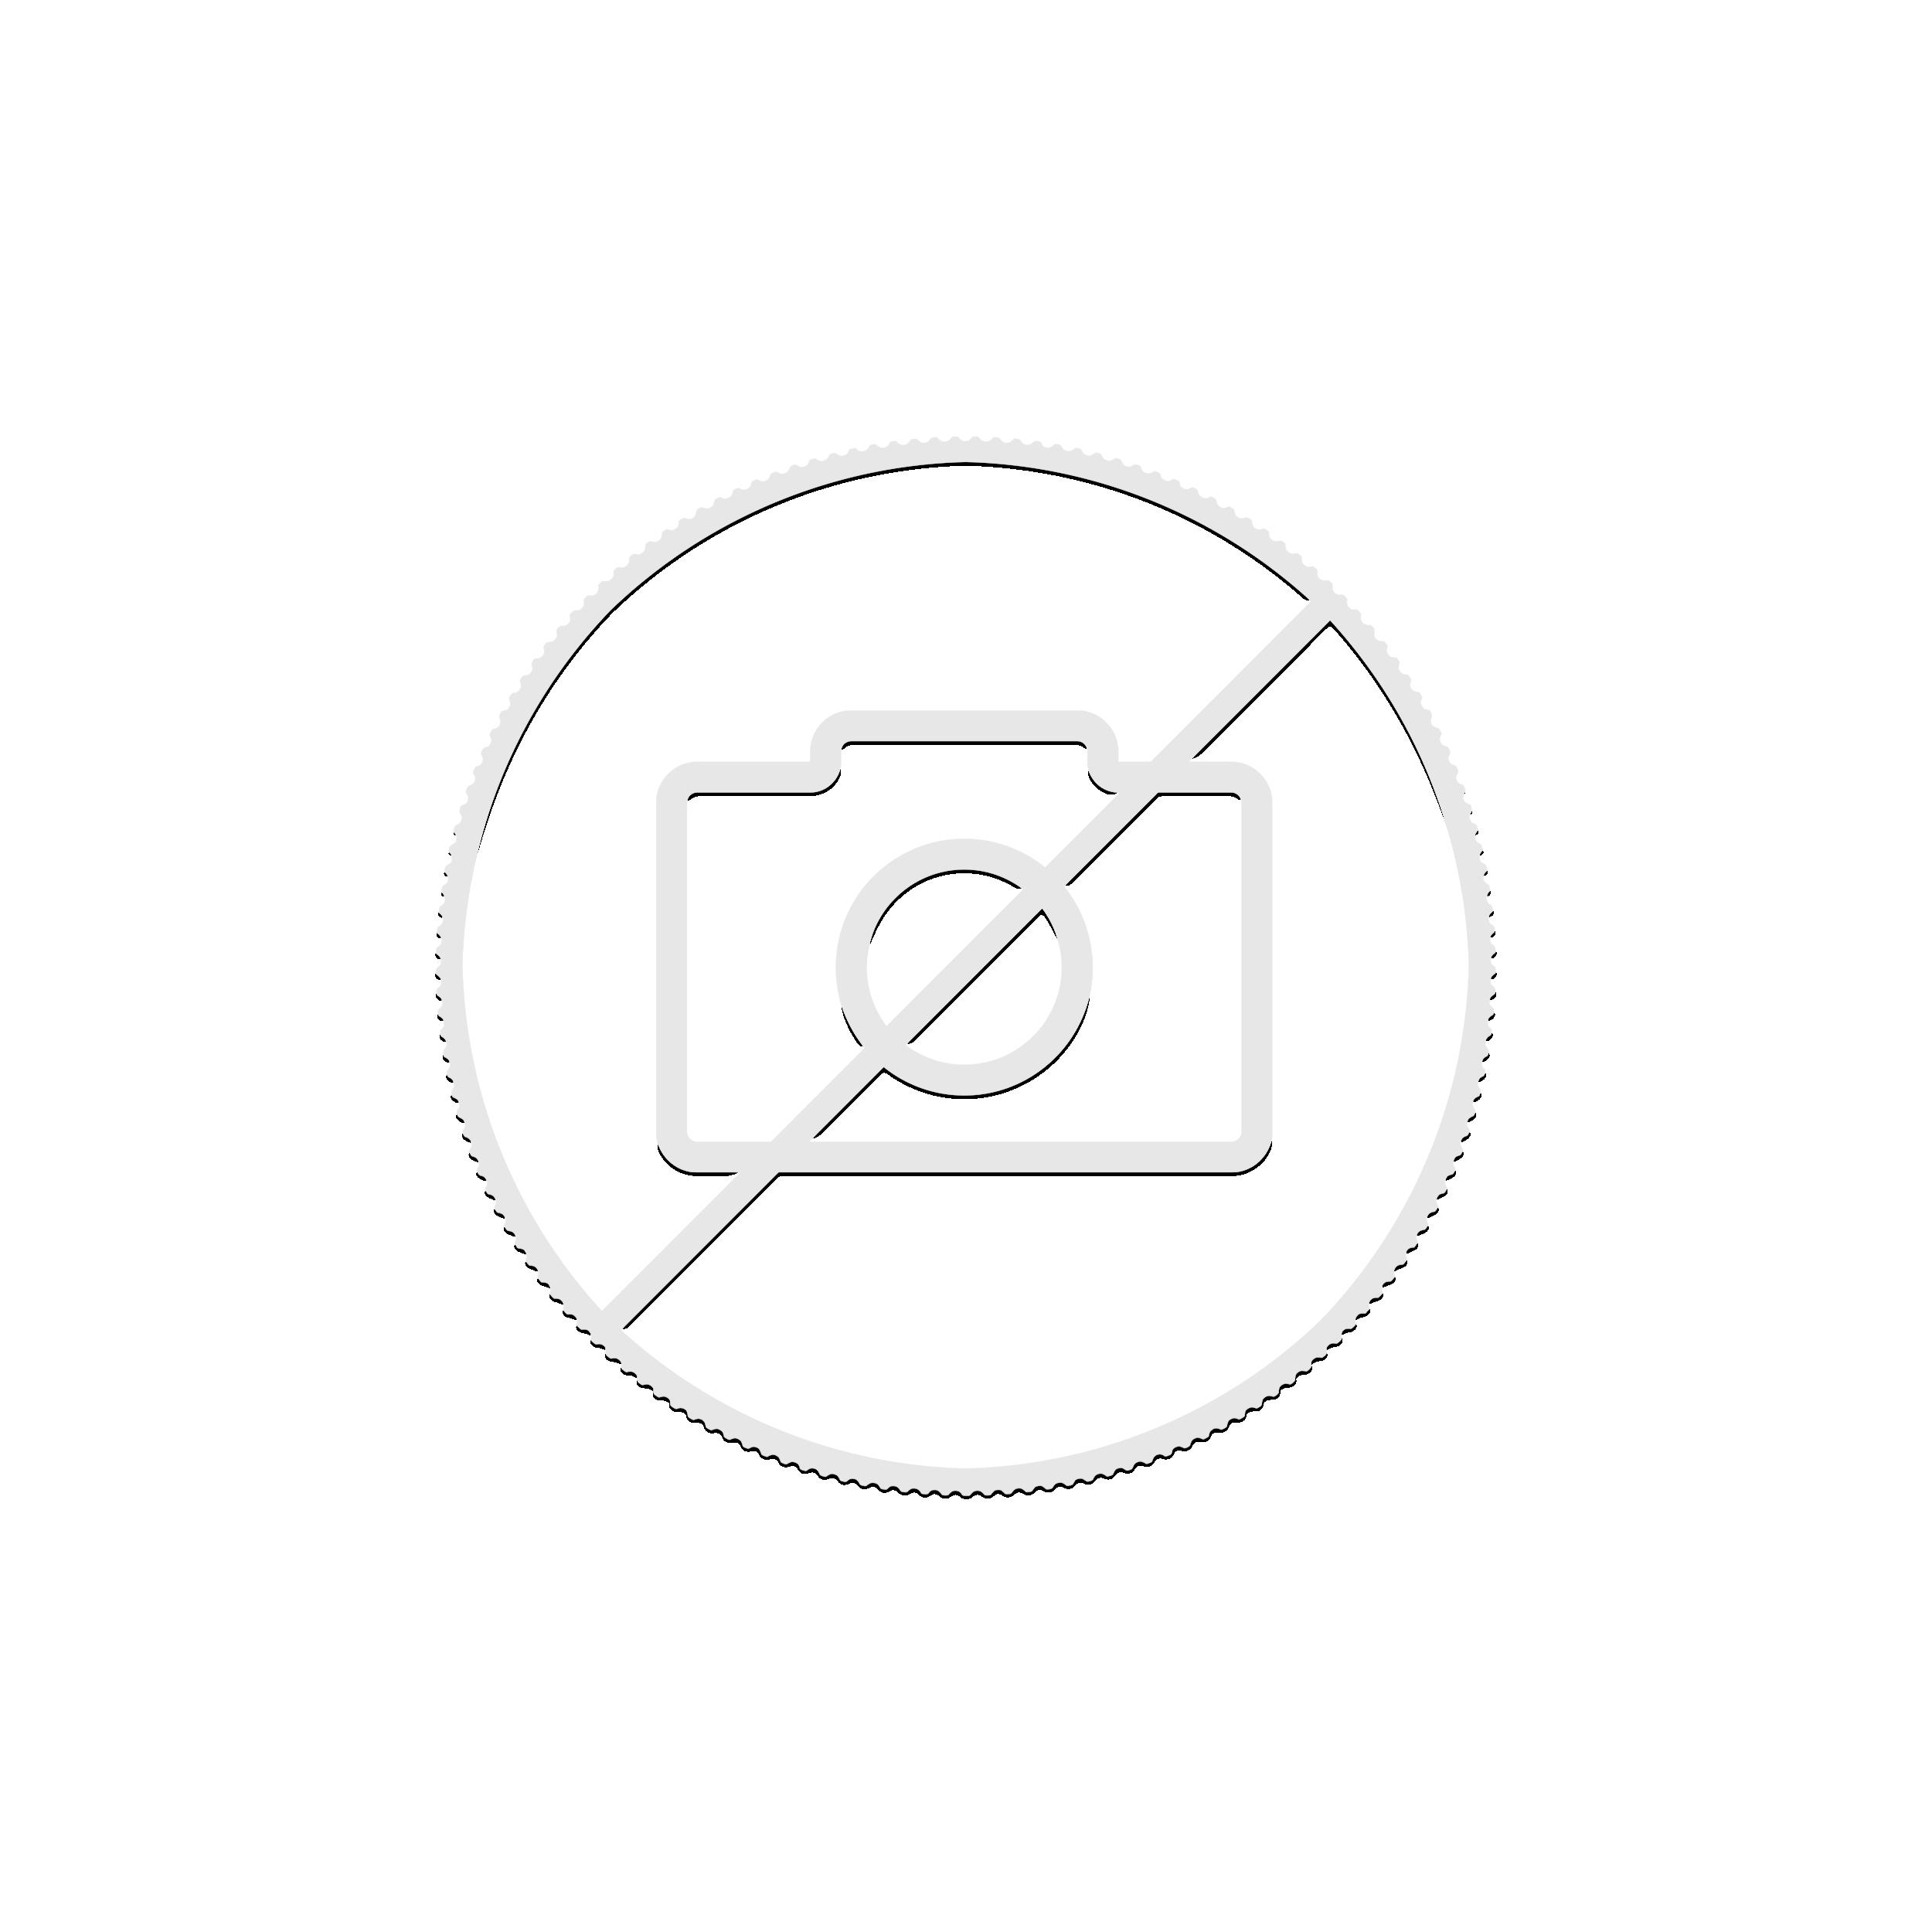 2 troy ounce zilveren munt Krugerrand 2021 Proof